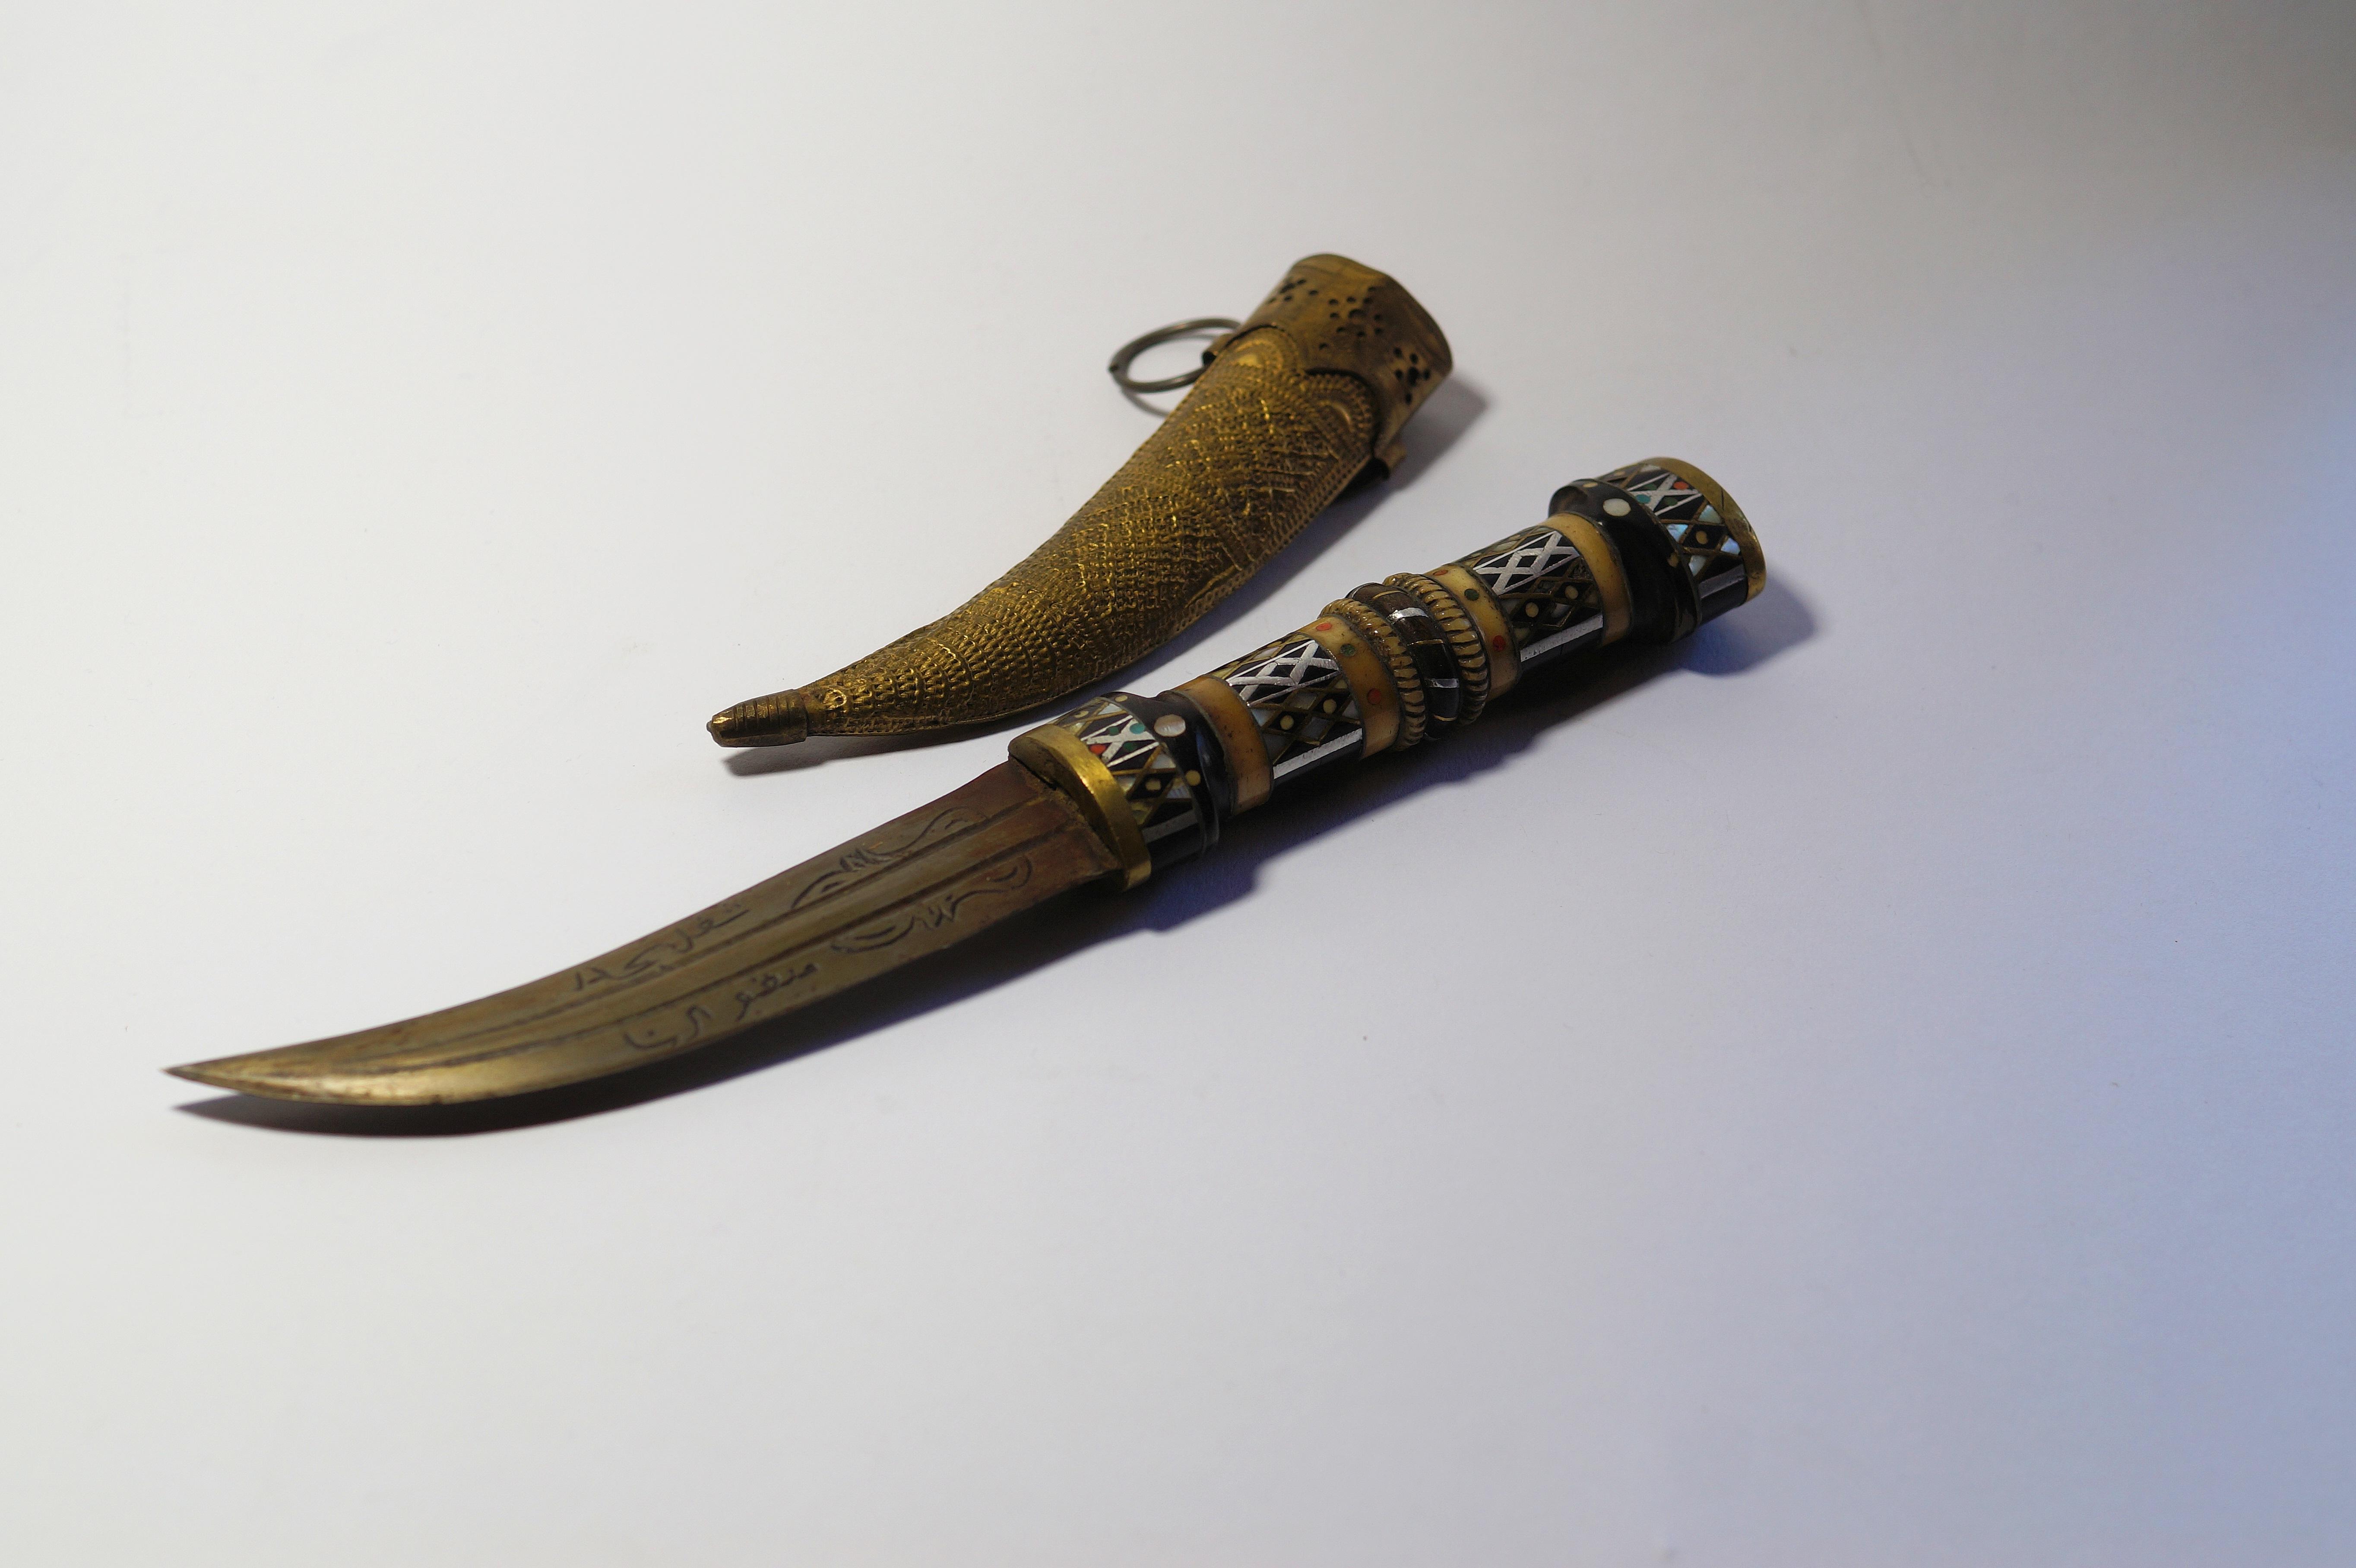 Free Images : horn, knife, sword, handmade, oriental, arabic